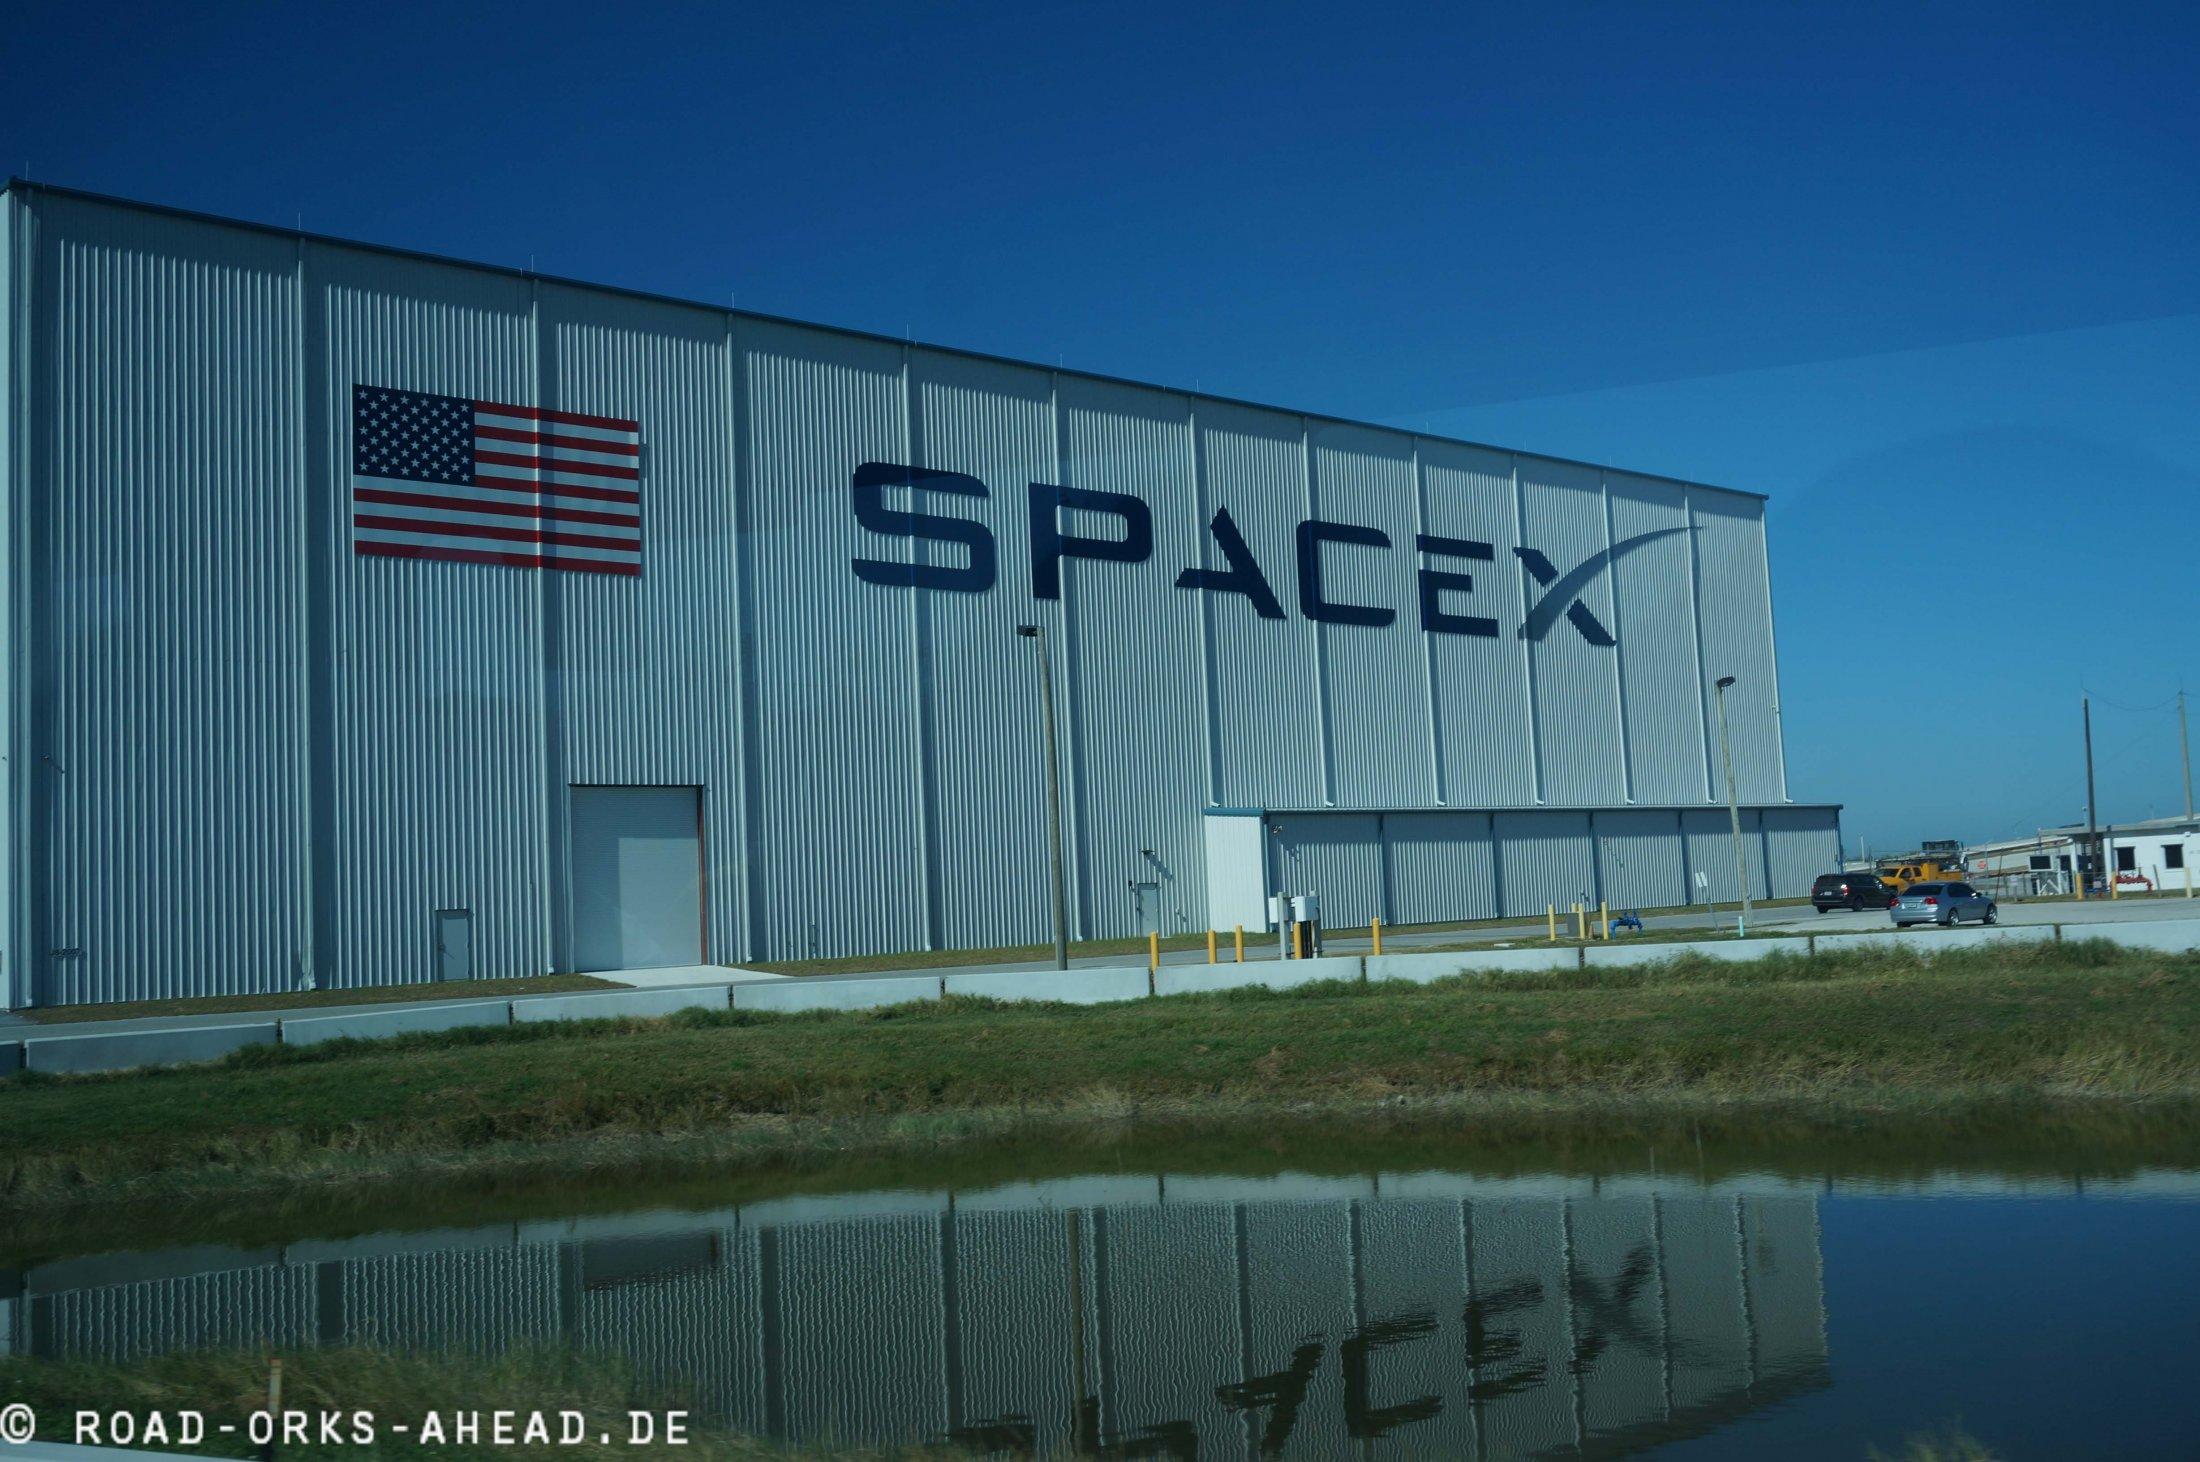 Kommerzielle Raumfahrt